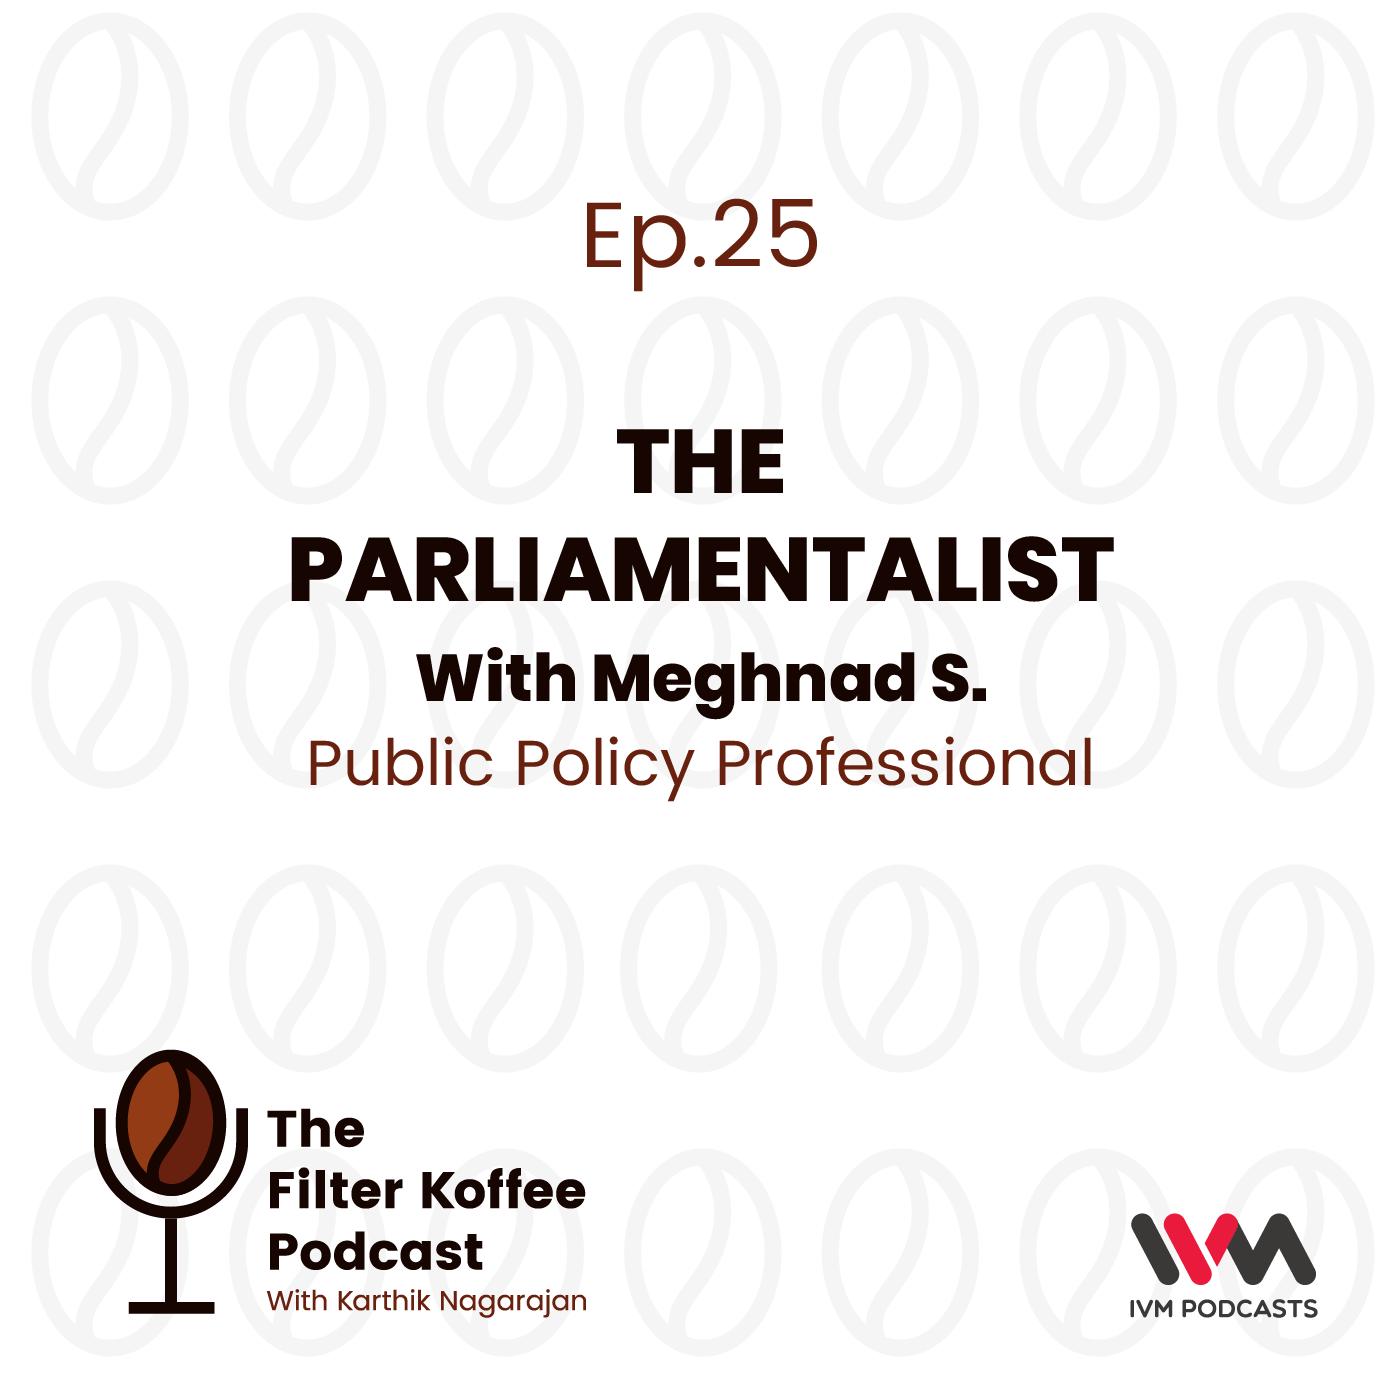 Ep. 25: The Parliamentalist